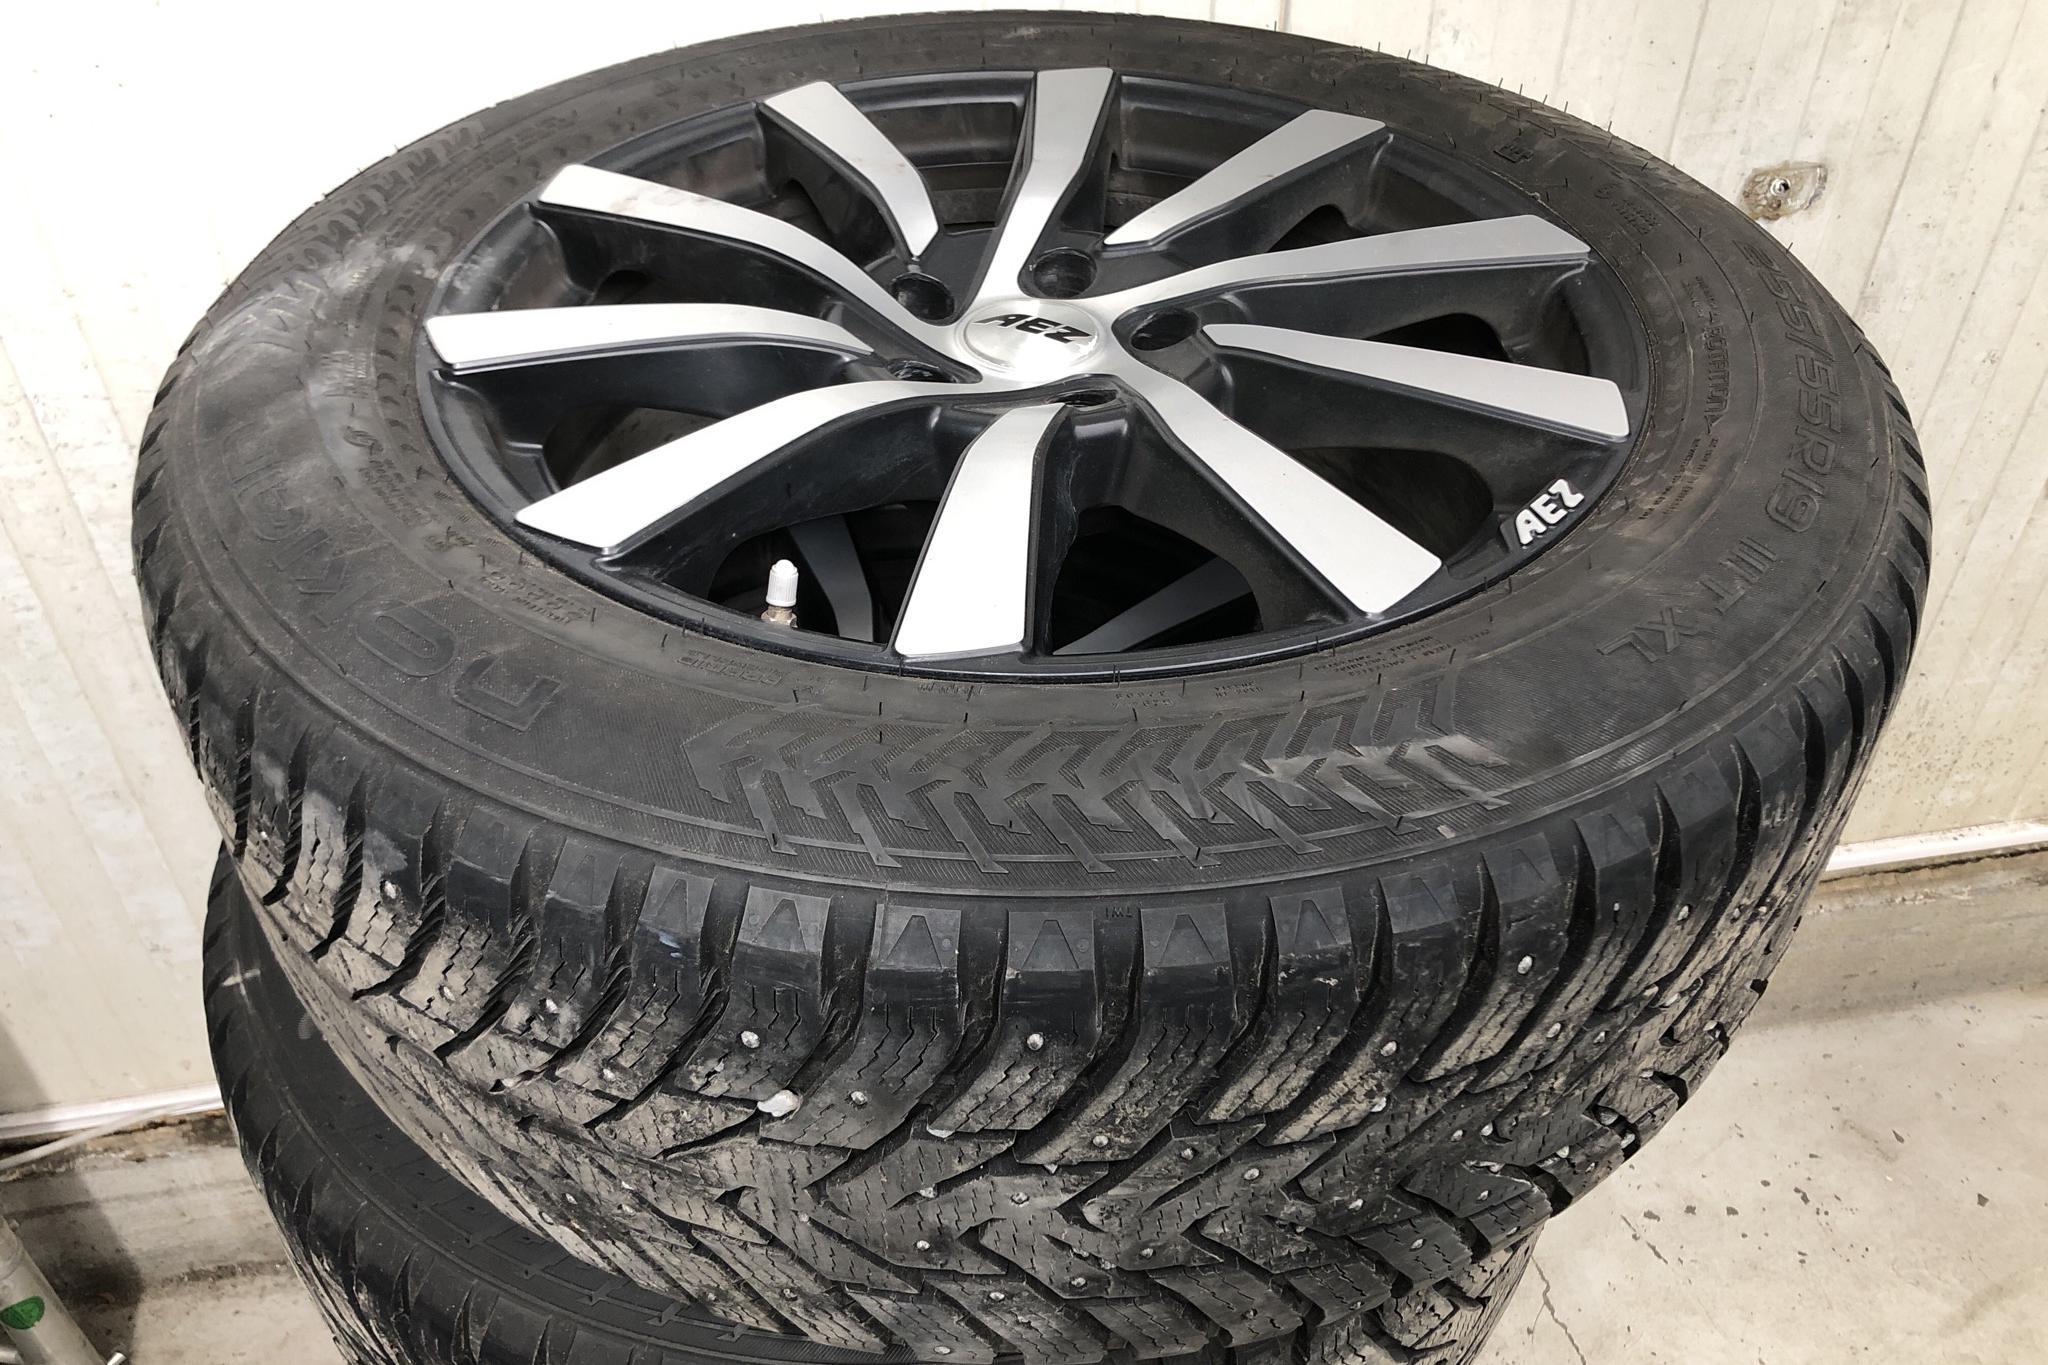 Land Rover Range Rover Sport 3.0 SDV6 (292hk) - 6 888 mil - Automat - grå - 2014